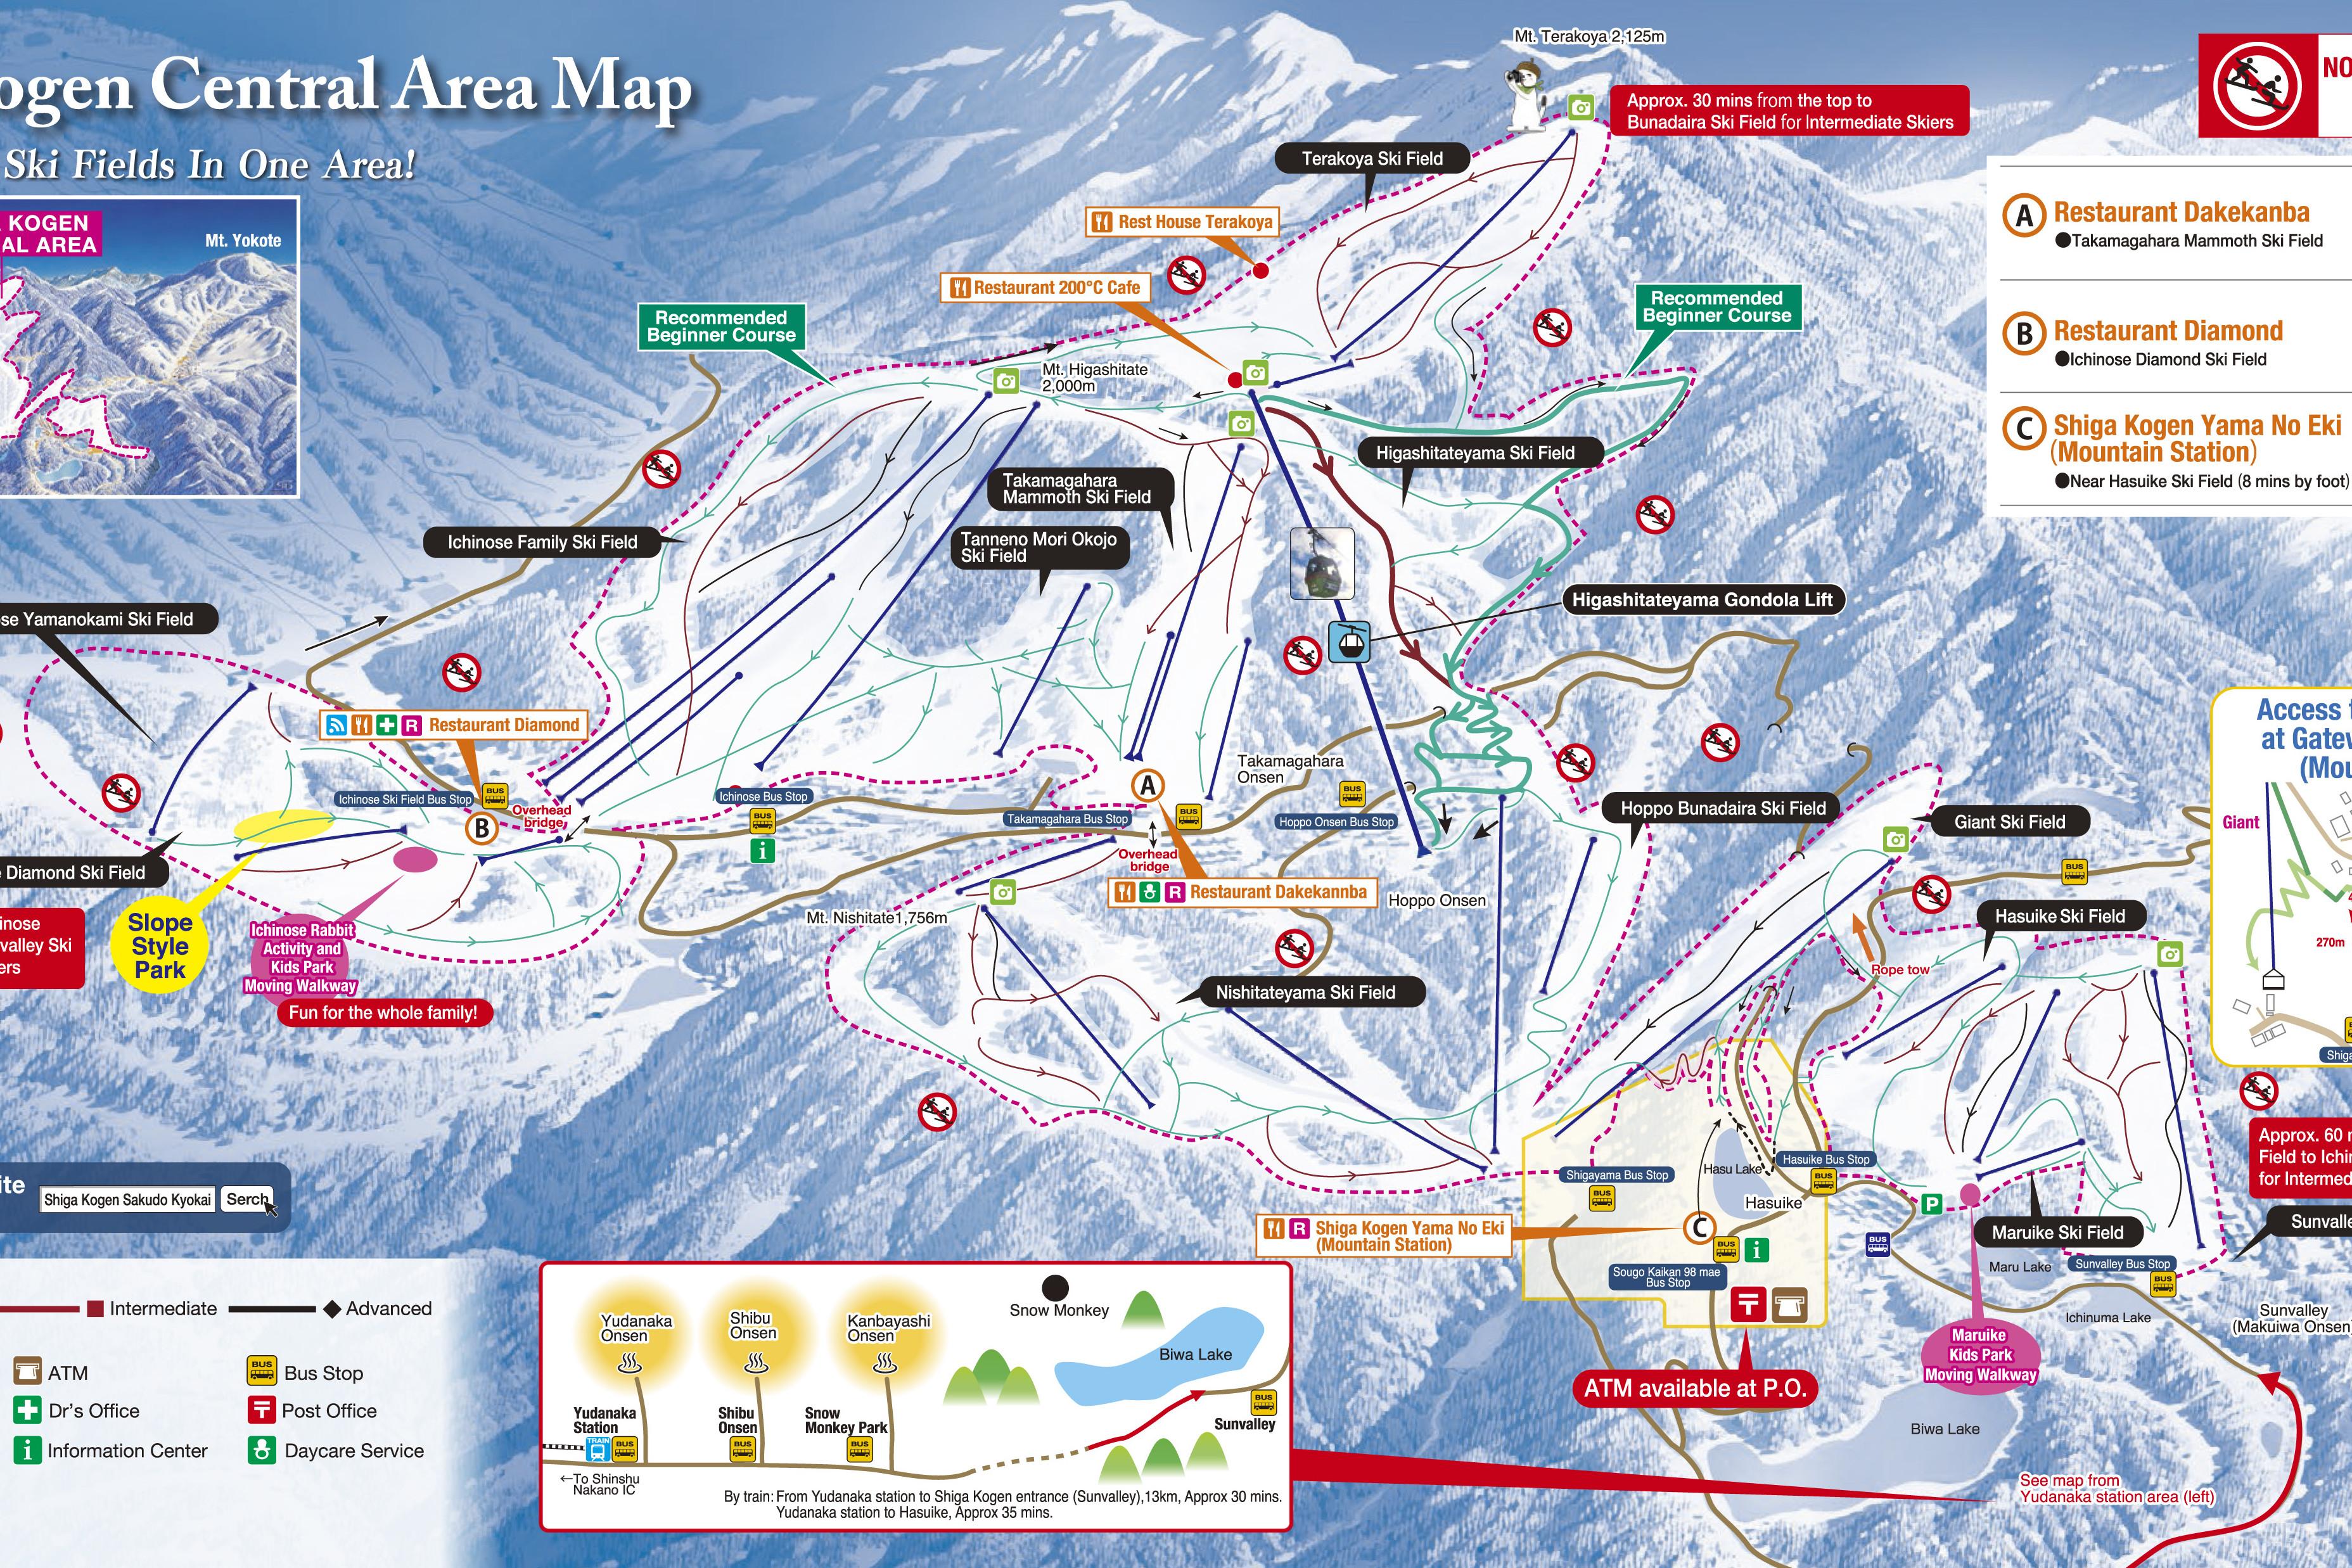 (EN) Central Area General Information